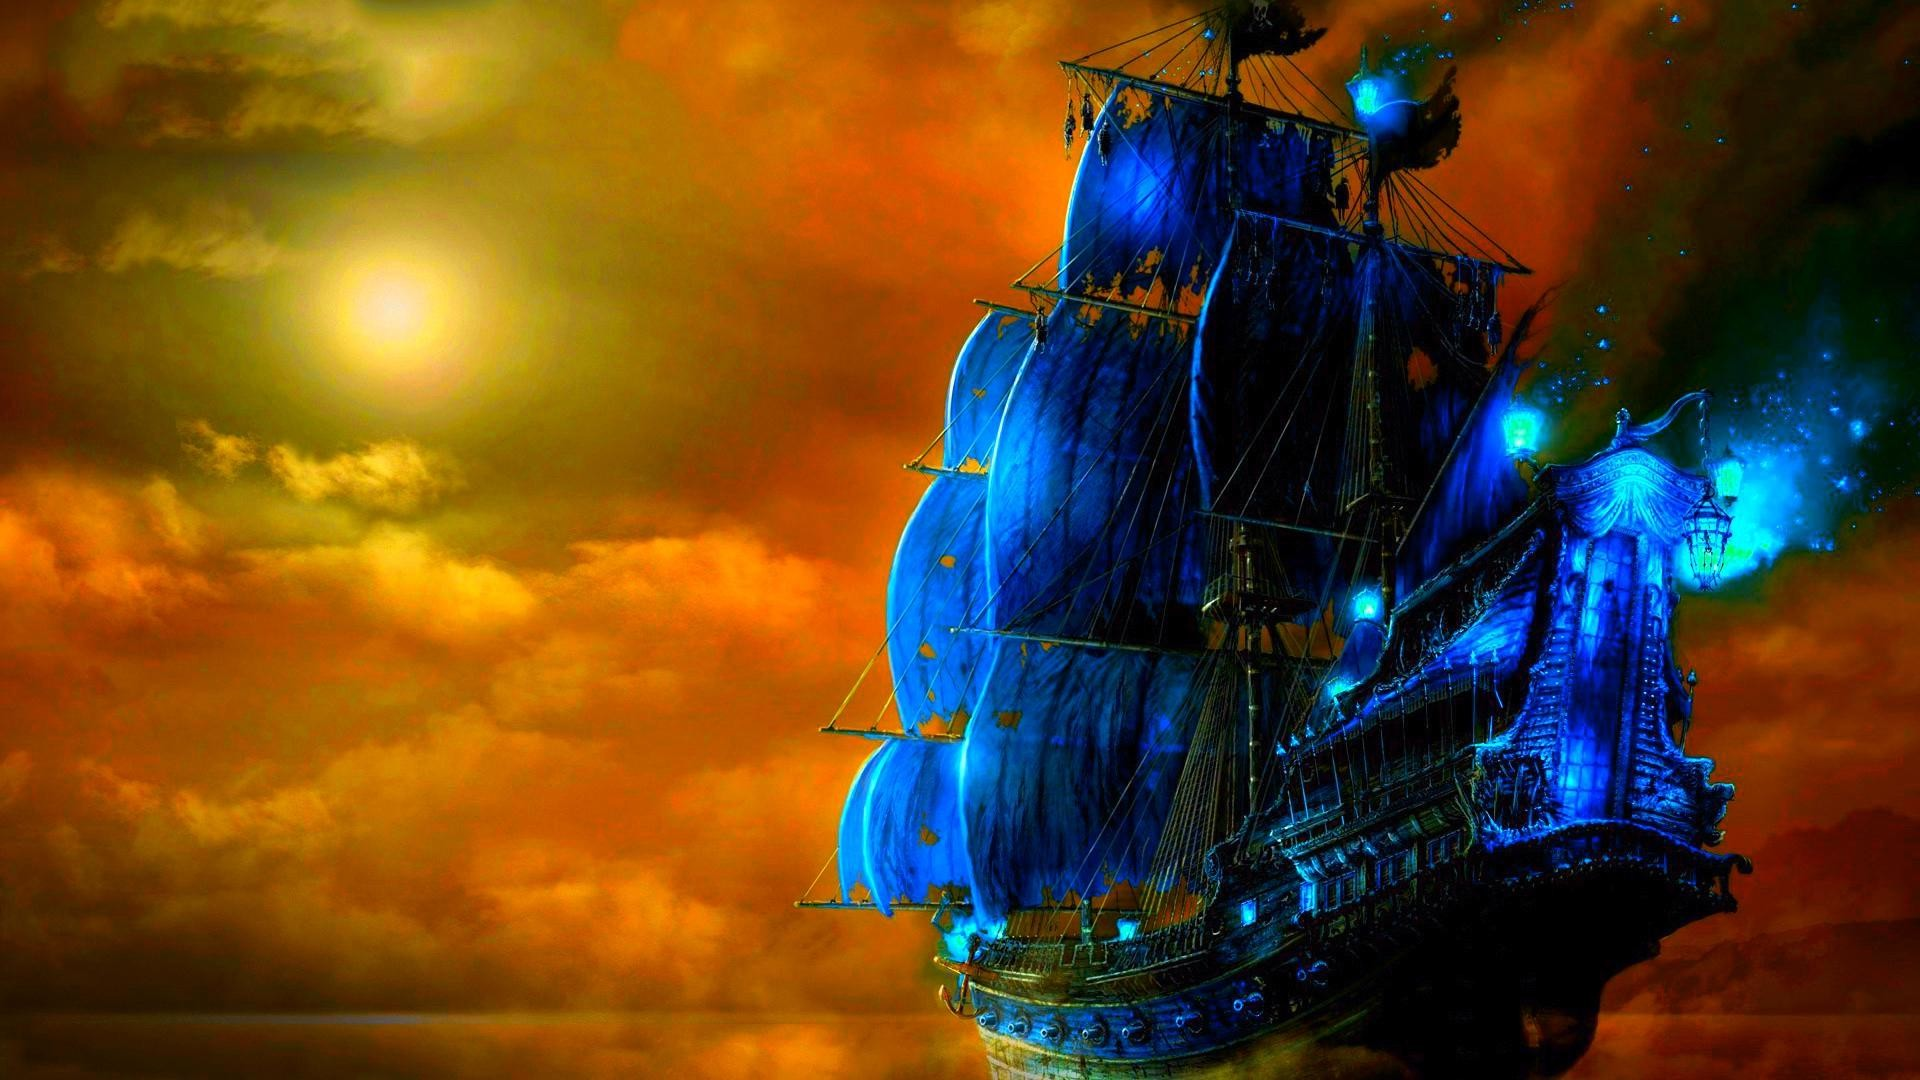 Ship HD Wallpapers Backgrounds Wallpaper 1920×1080 Pirate Ships Wallpapers  (53 Wallpapers)   Adorable Wallpapers   Wallpapers   Pinterest   Pirati, …